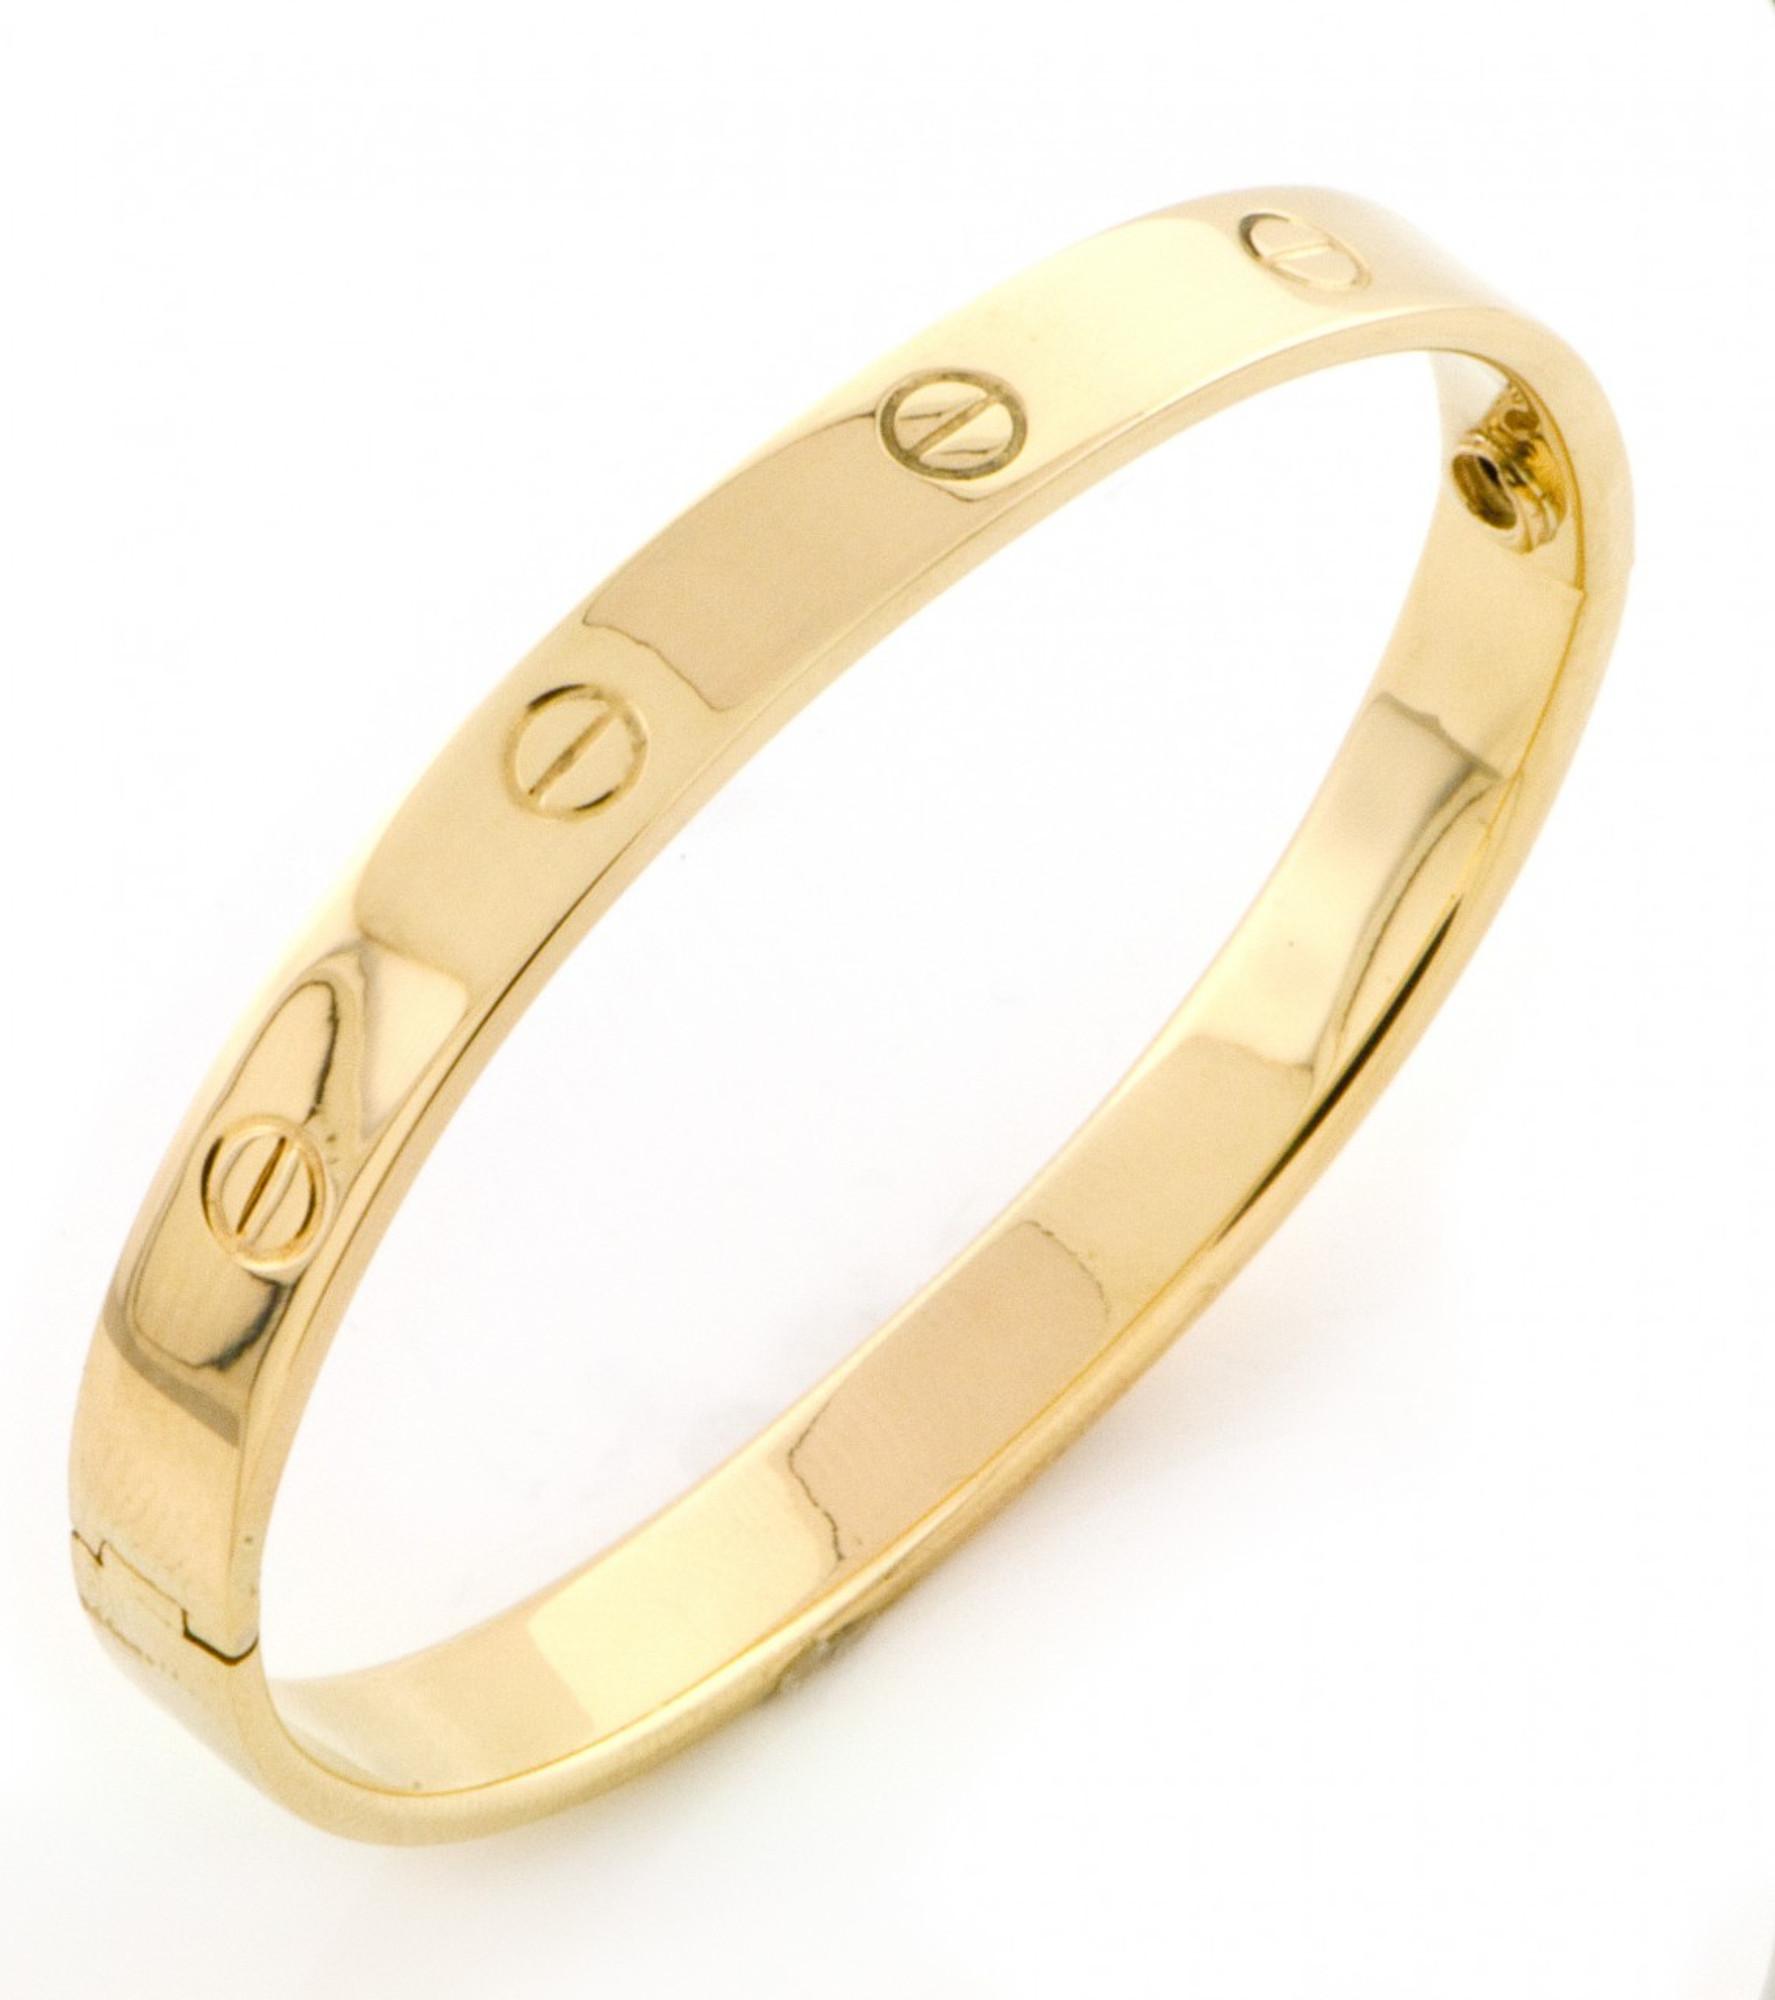 21k Yellow Gold Vikings Bangle Bracelet 21.21